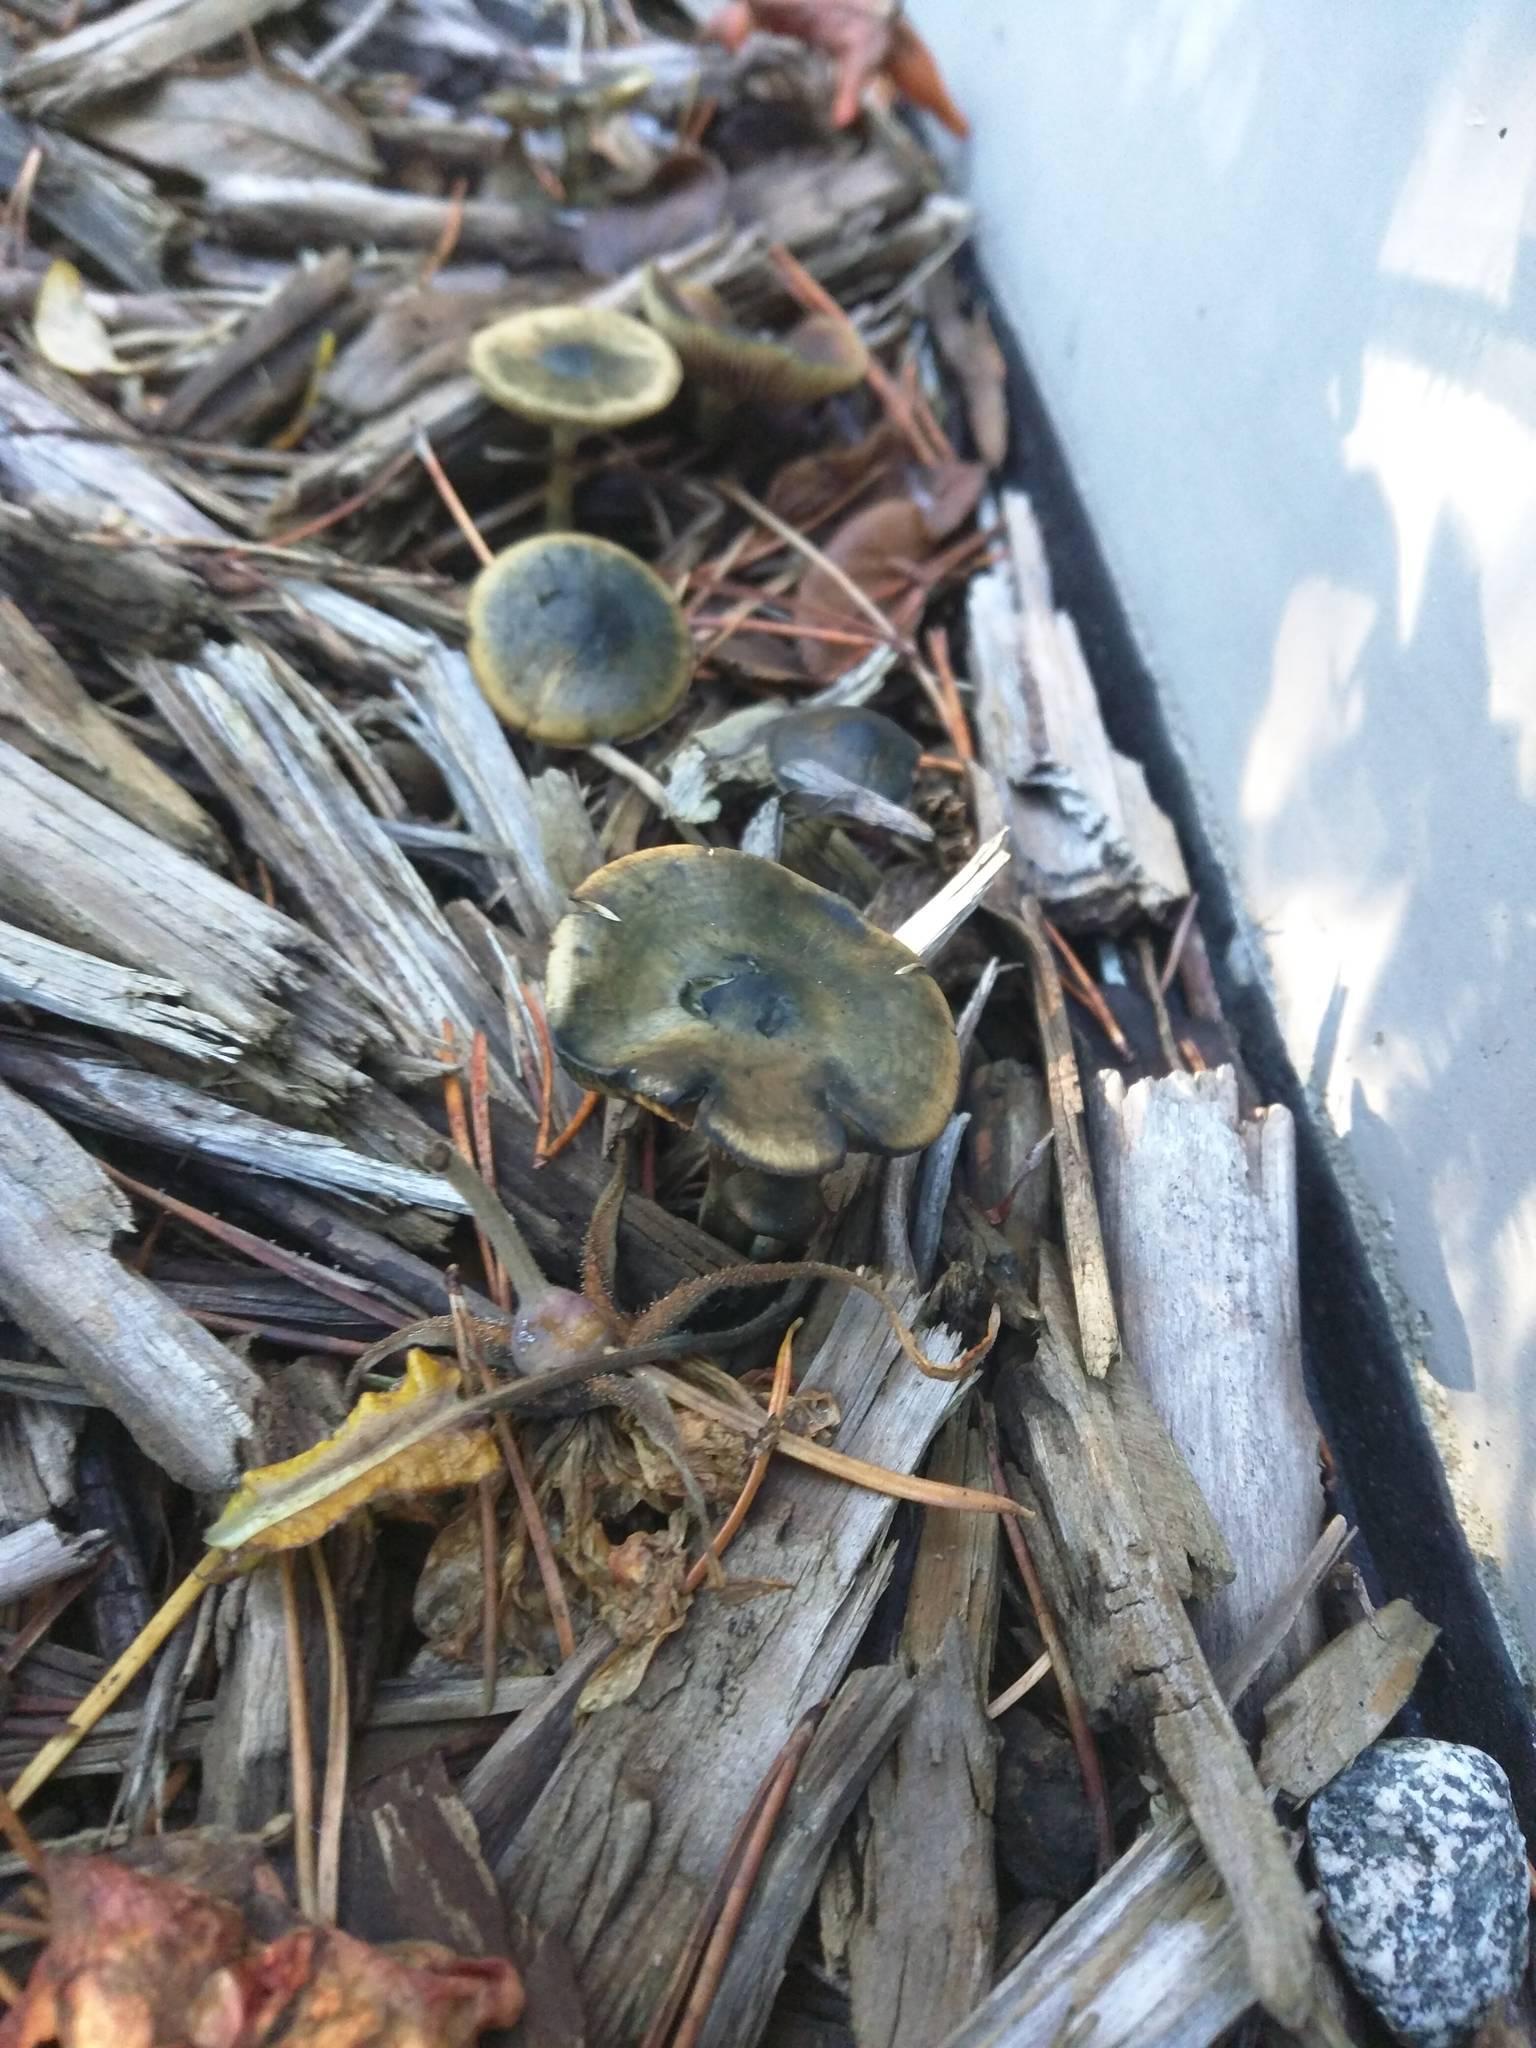 PNW: Psilocybe cyanescens with blackening on caps